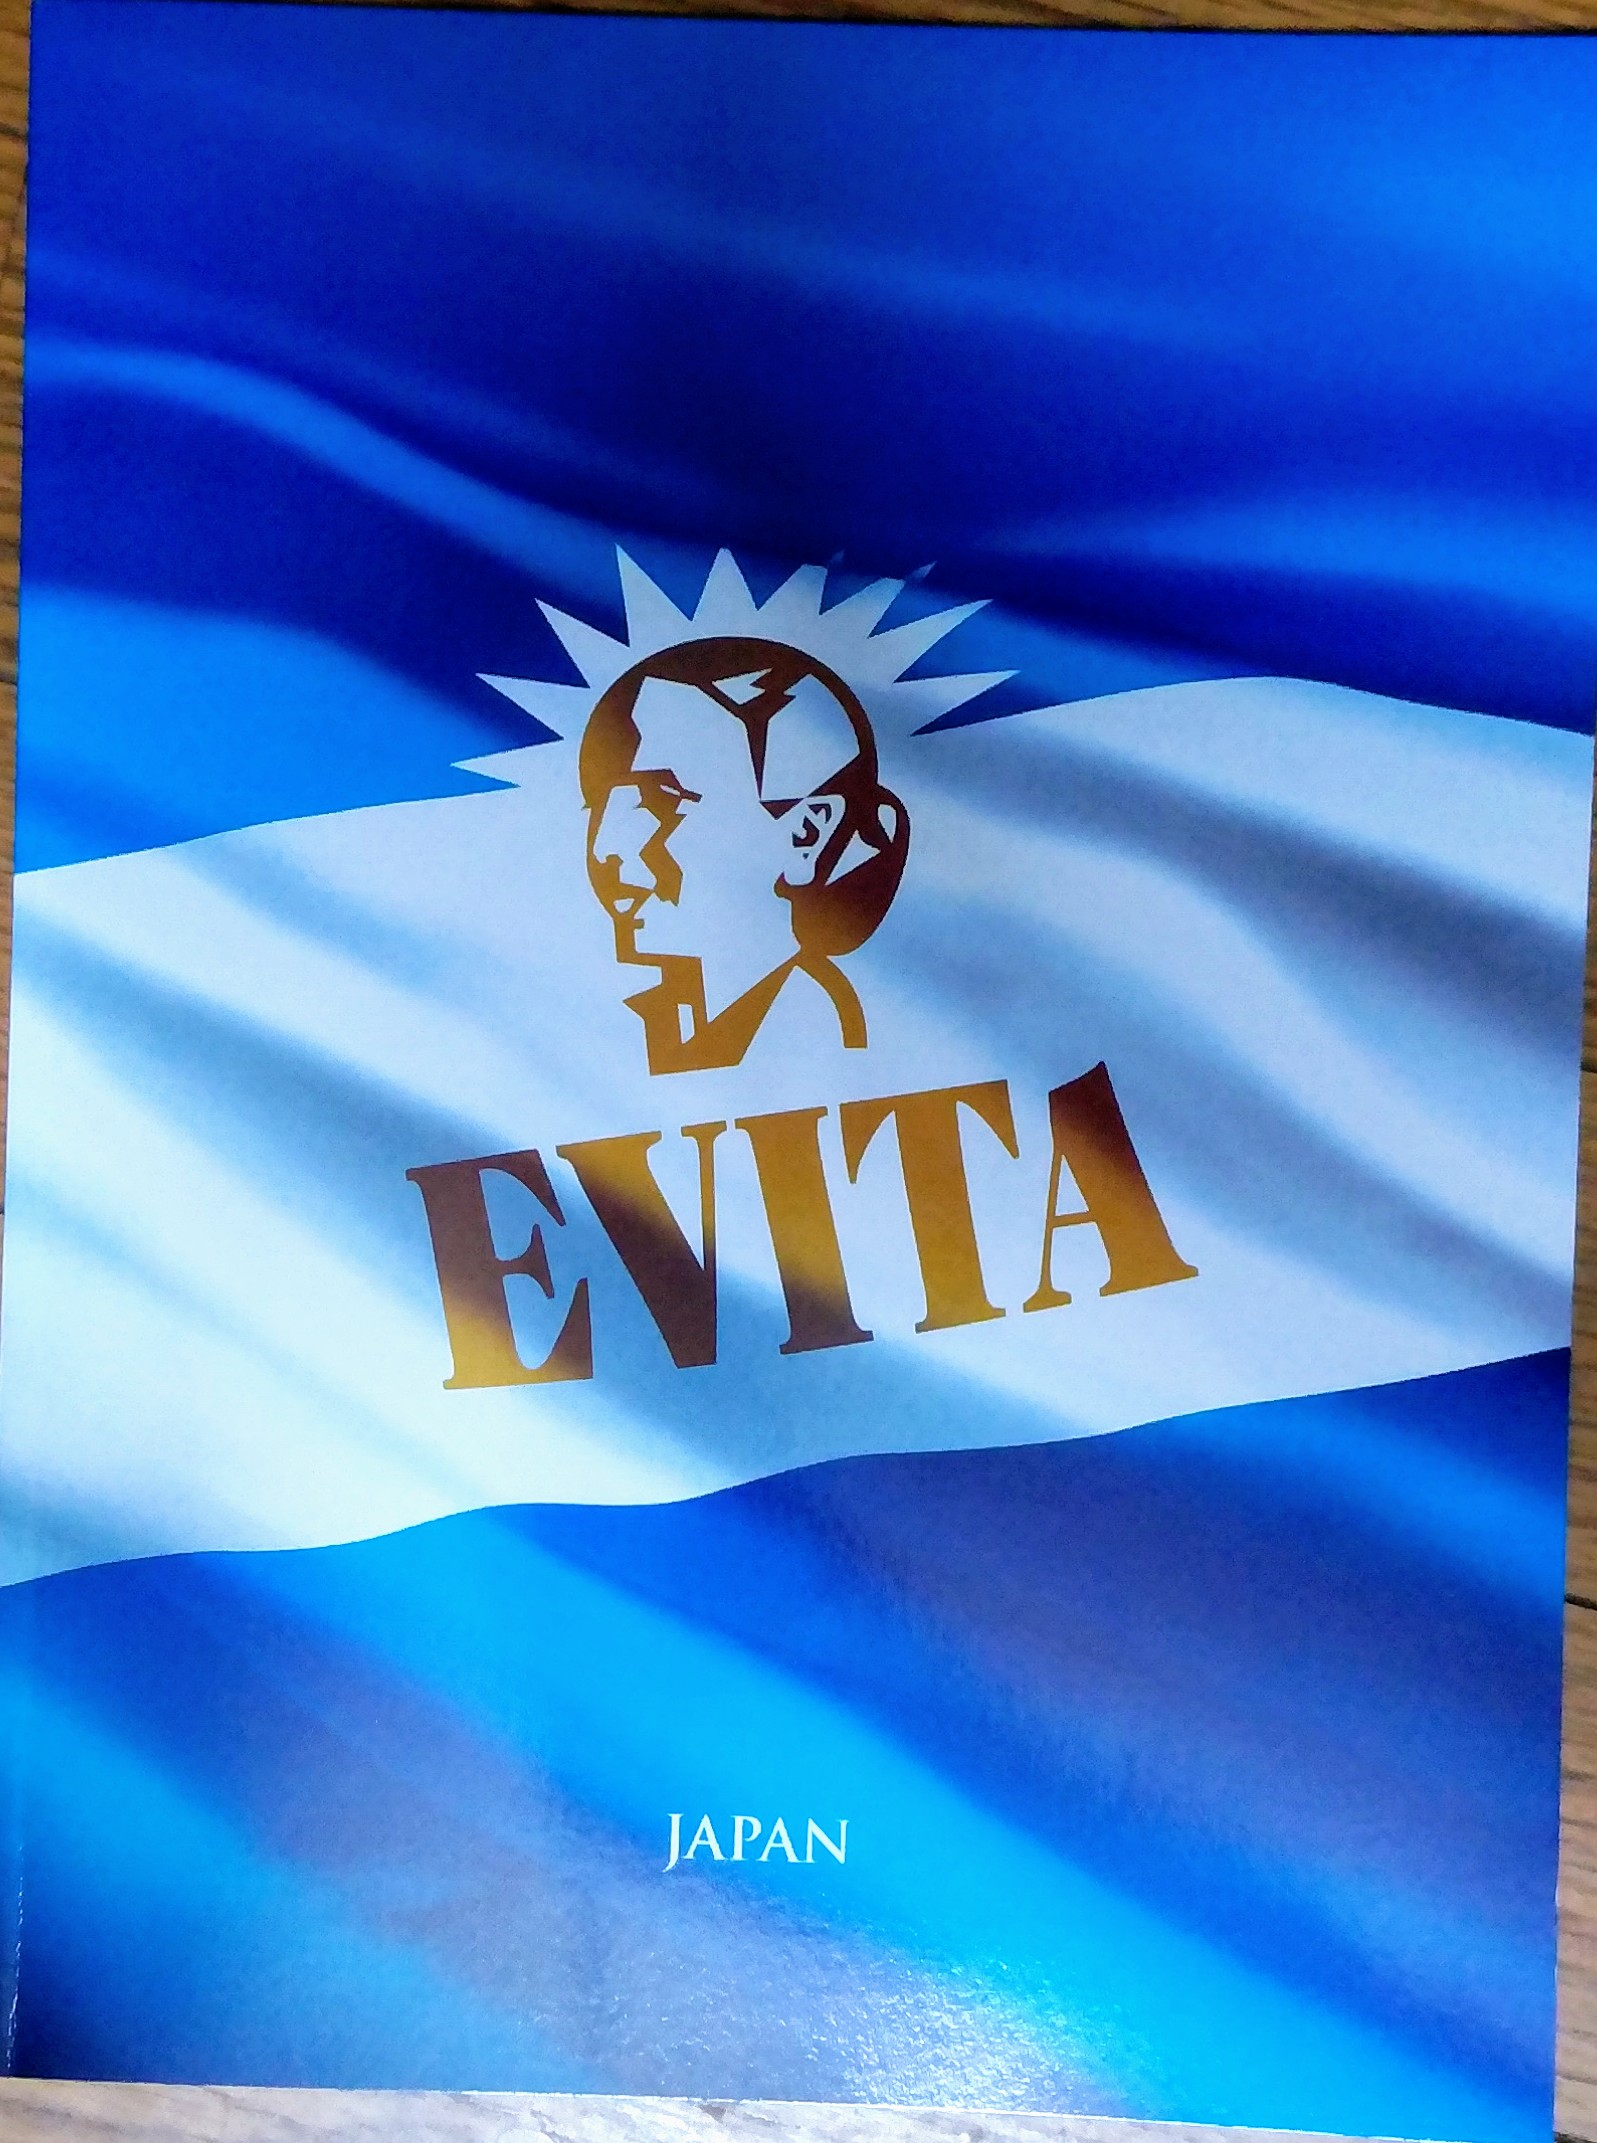 「EVITA」のパンフ到着